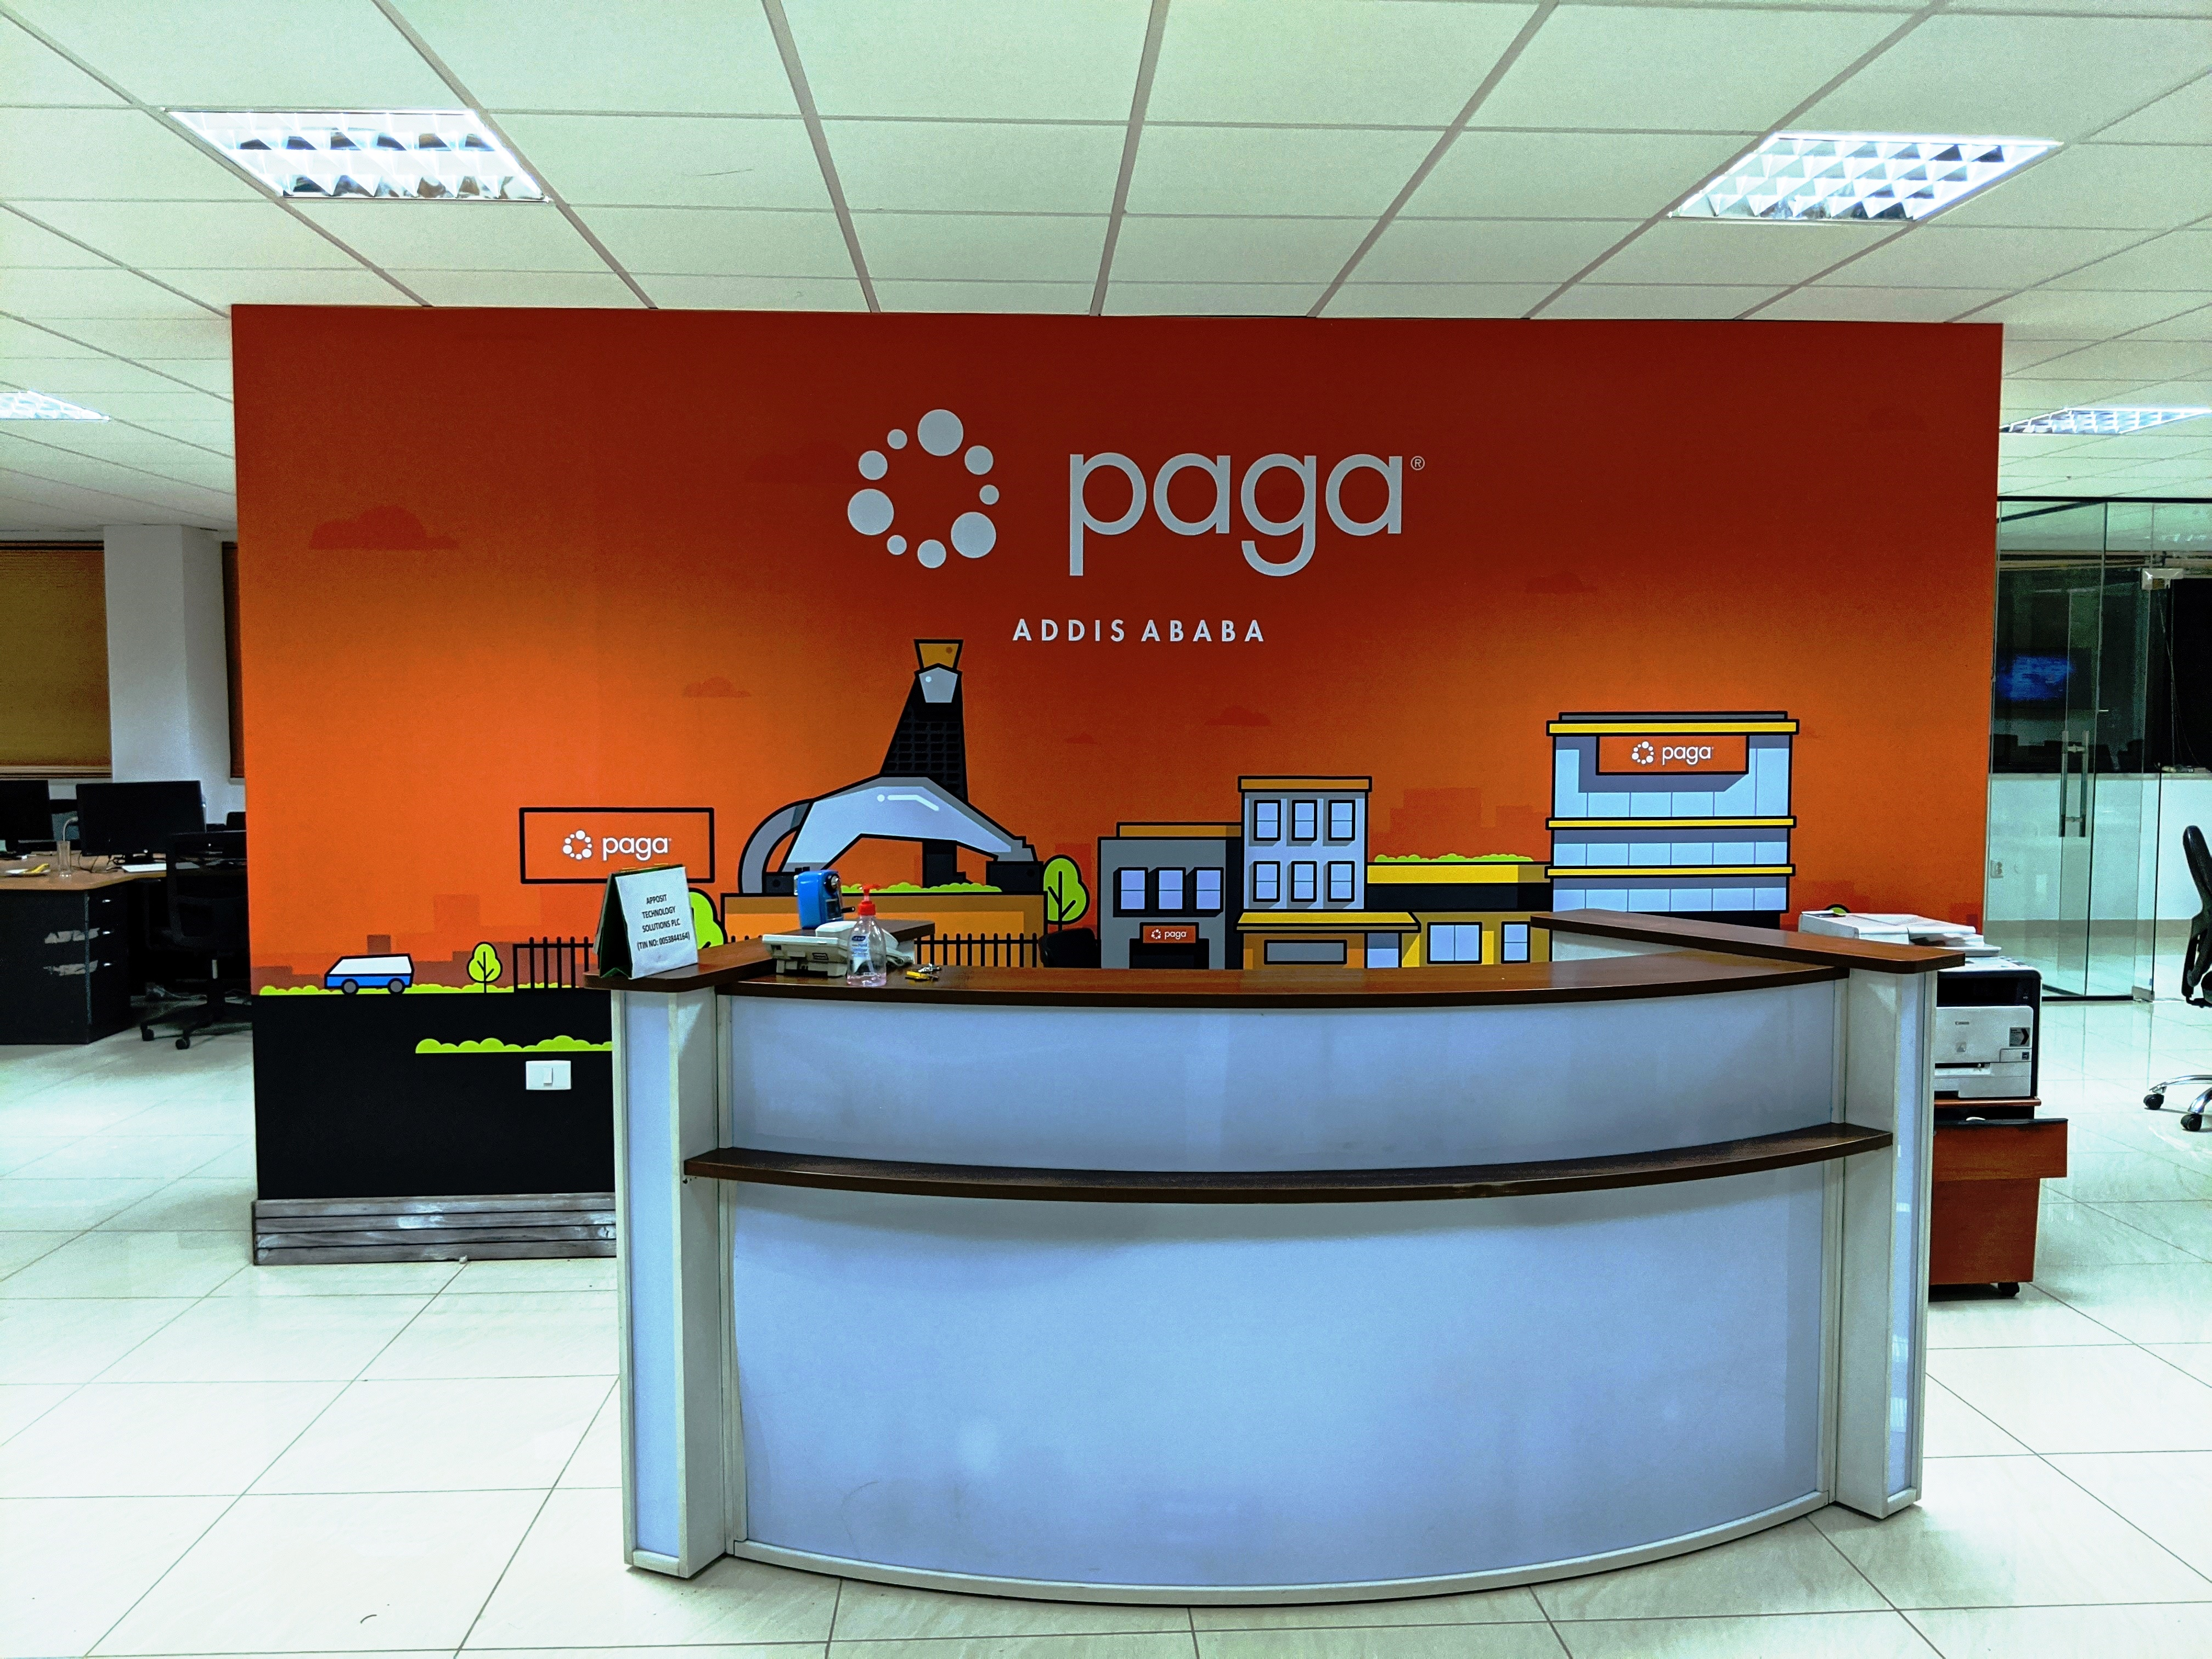 Nigeria S Paga Acquires Apposit Confirms Mexico And Ethiopia Expansion Techcrunch